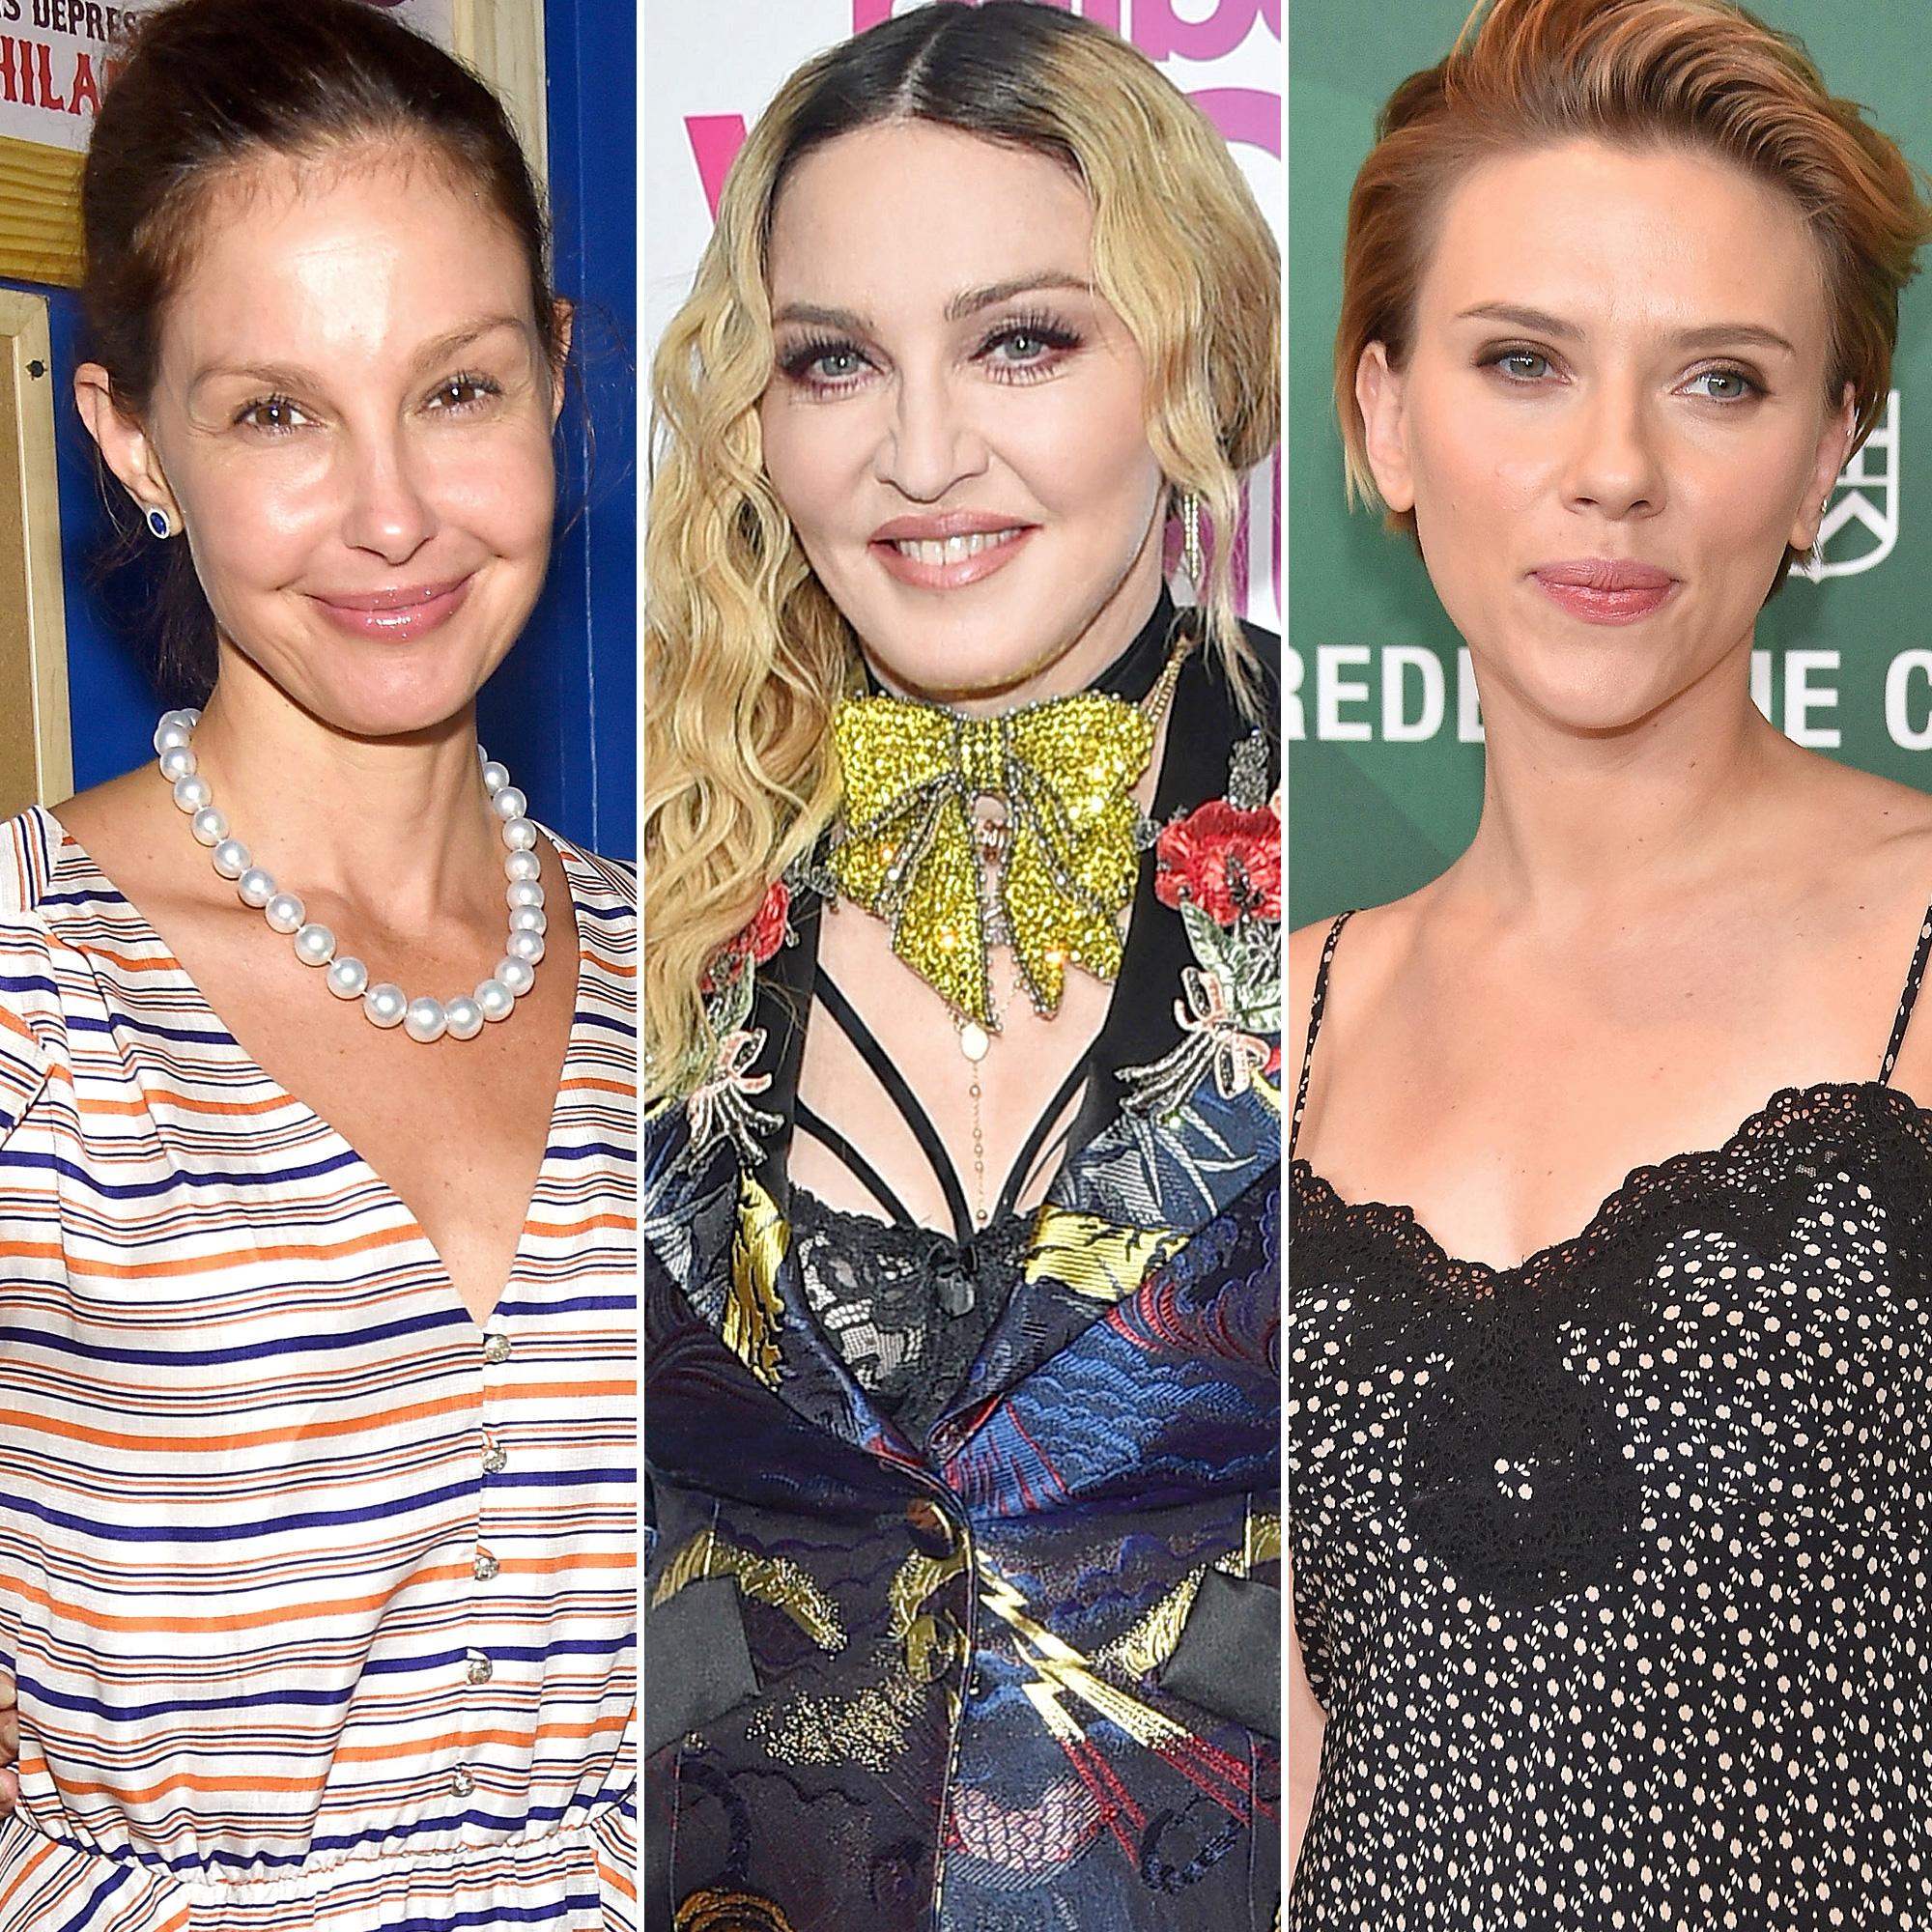 Ashley Judd, Madonna and Scarlett Johansson